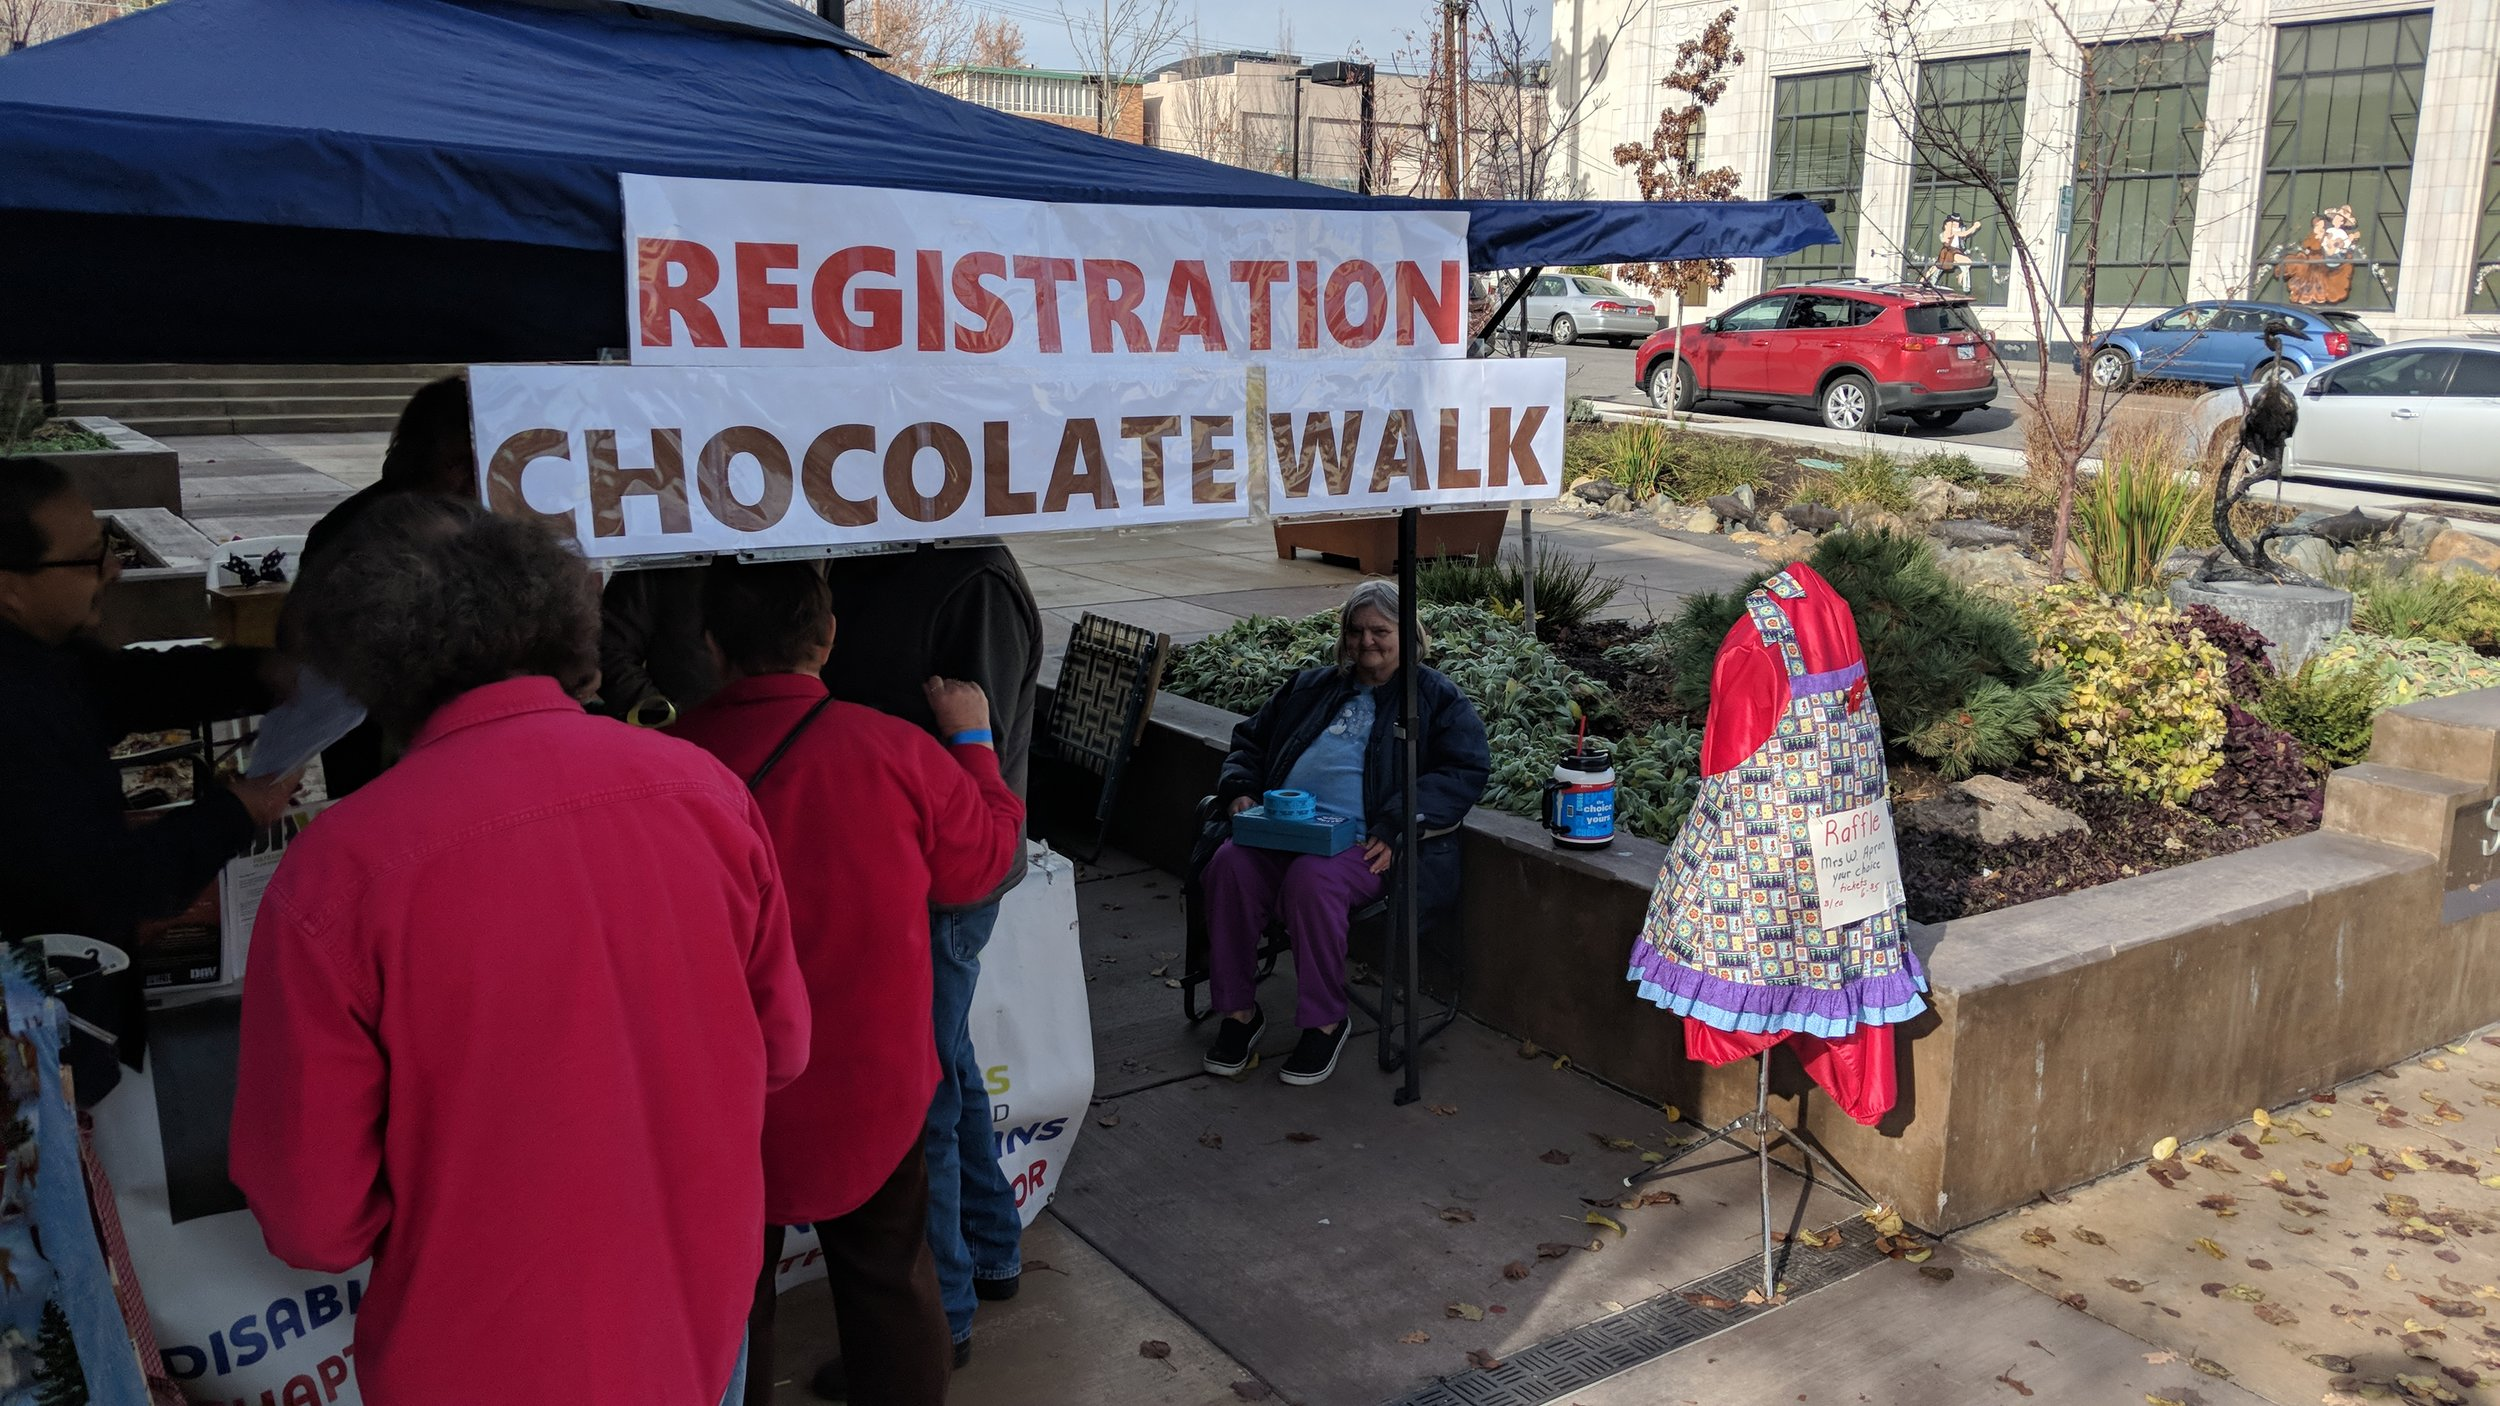 Chocolate Walk for Charity (Brian Gailey)